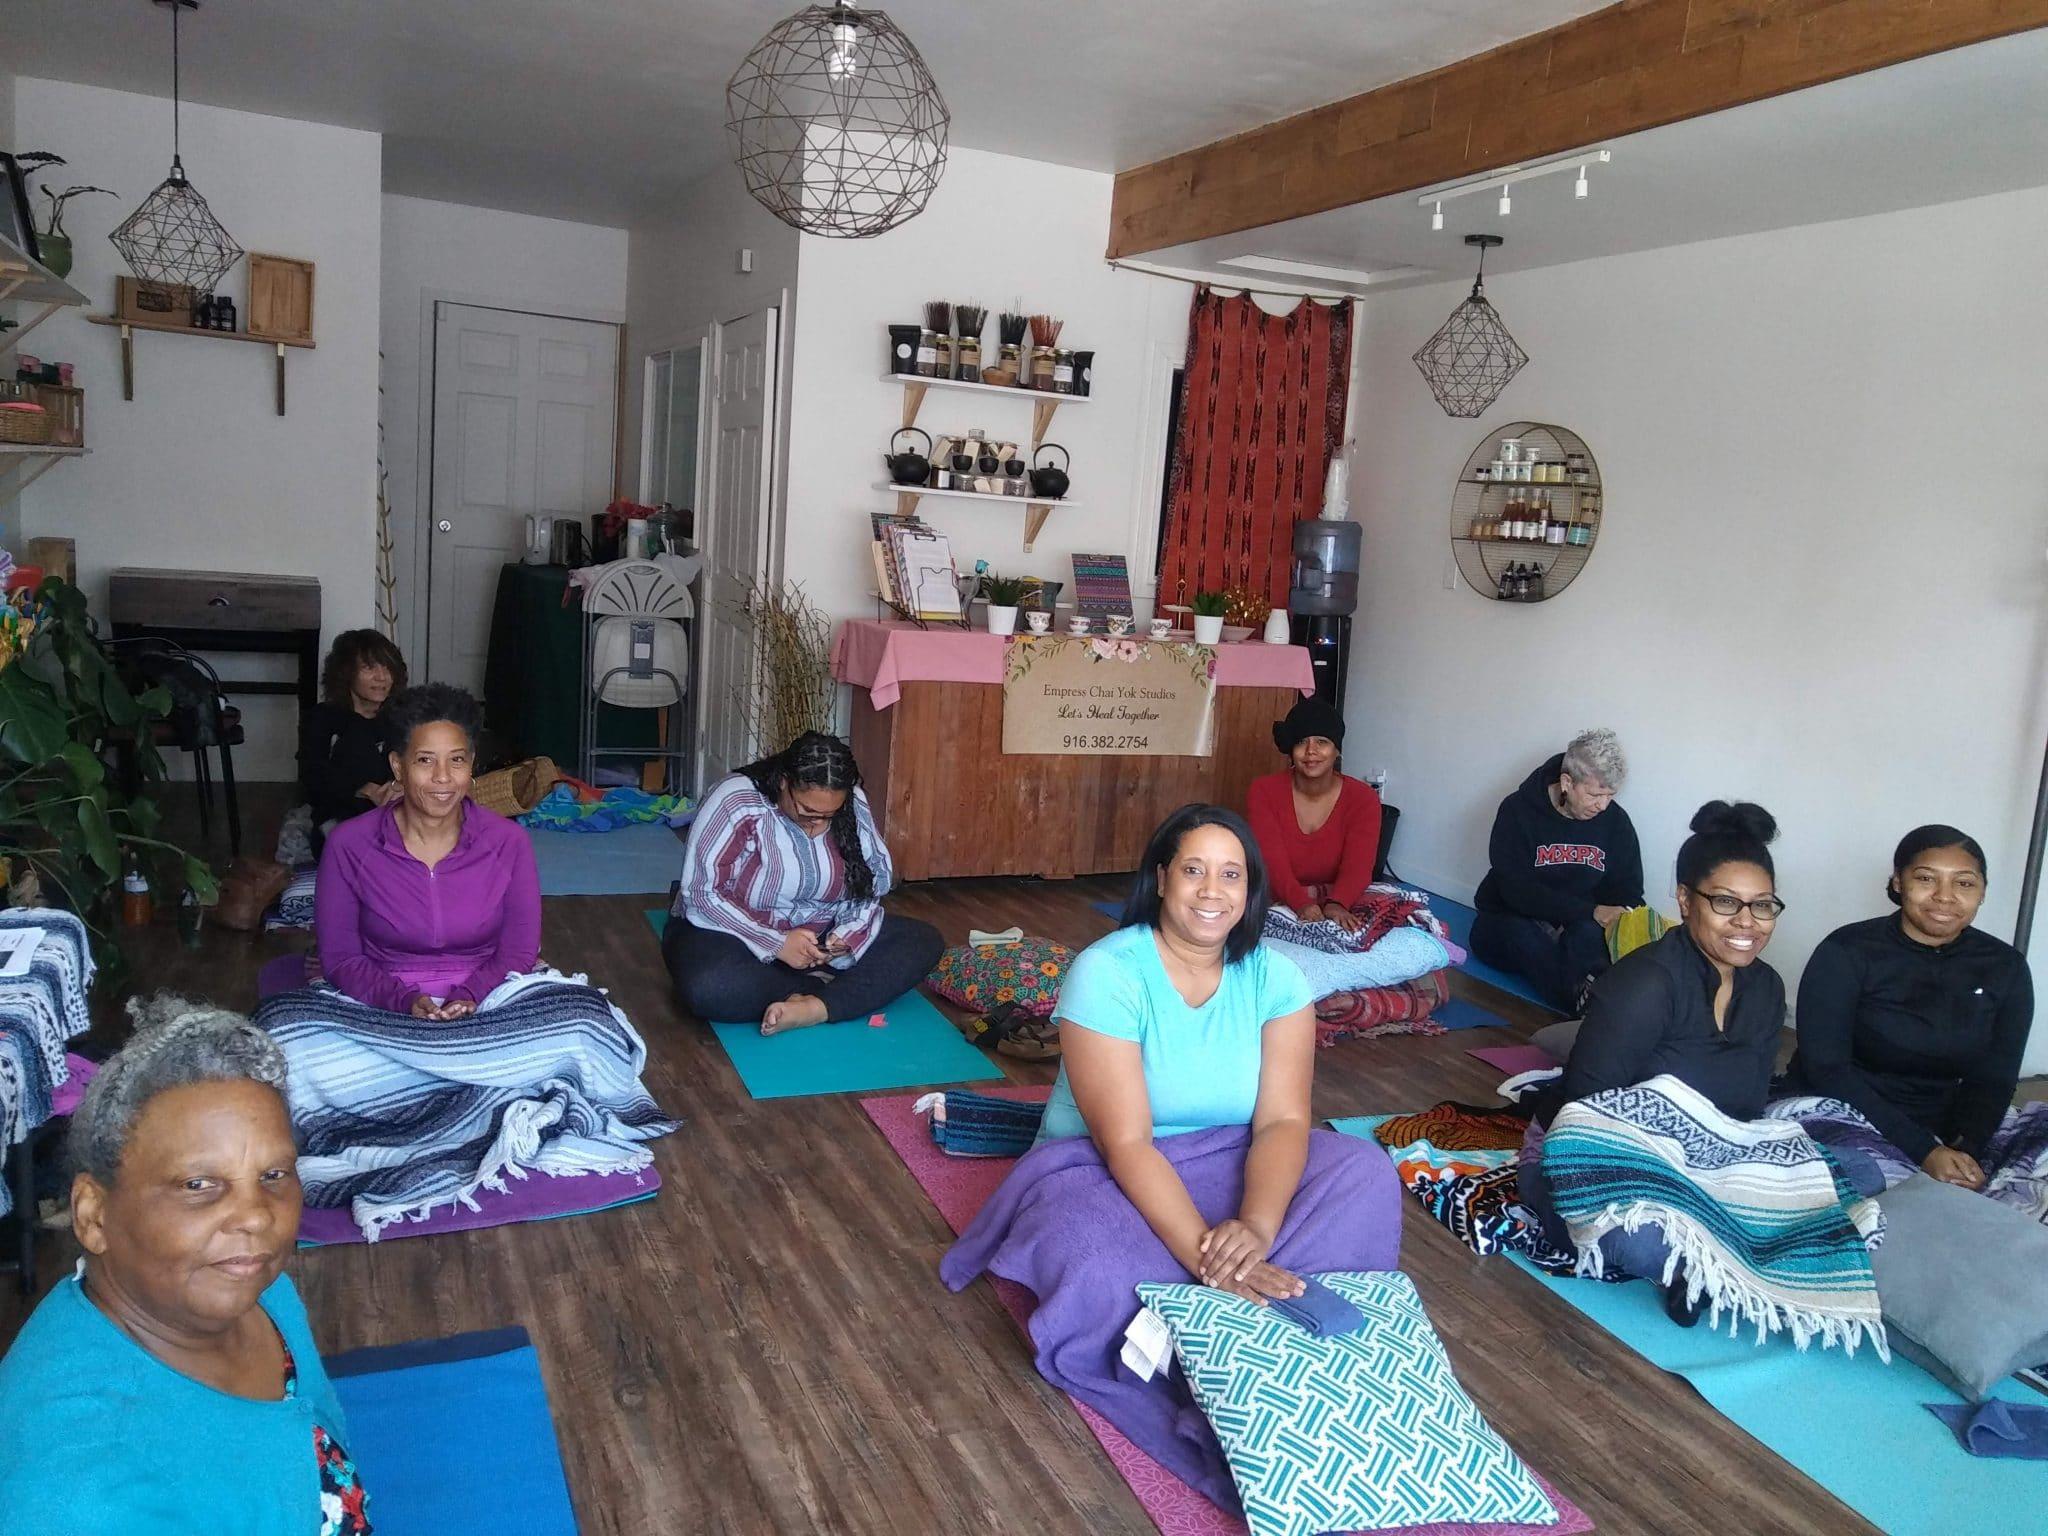 Sacramento christian yoga class